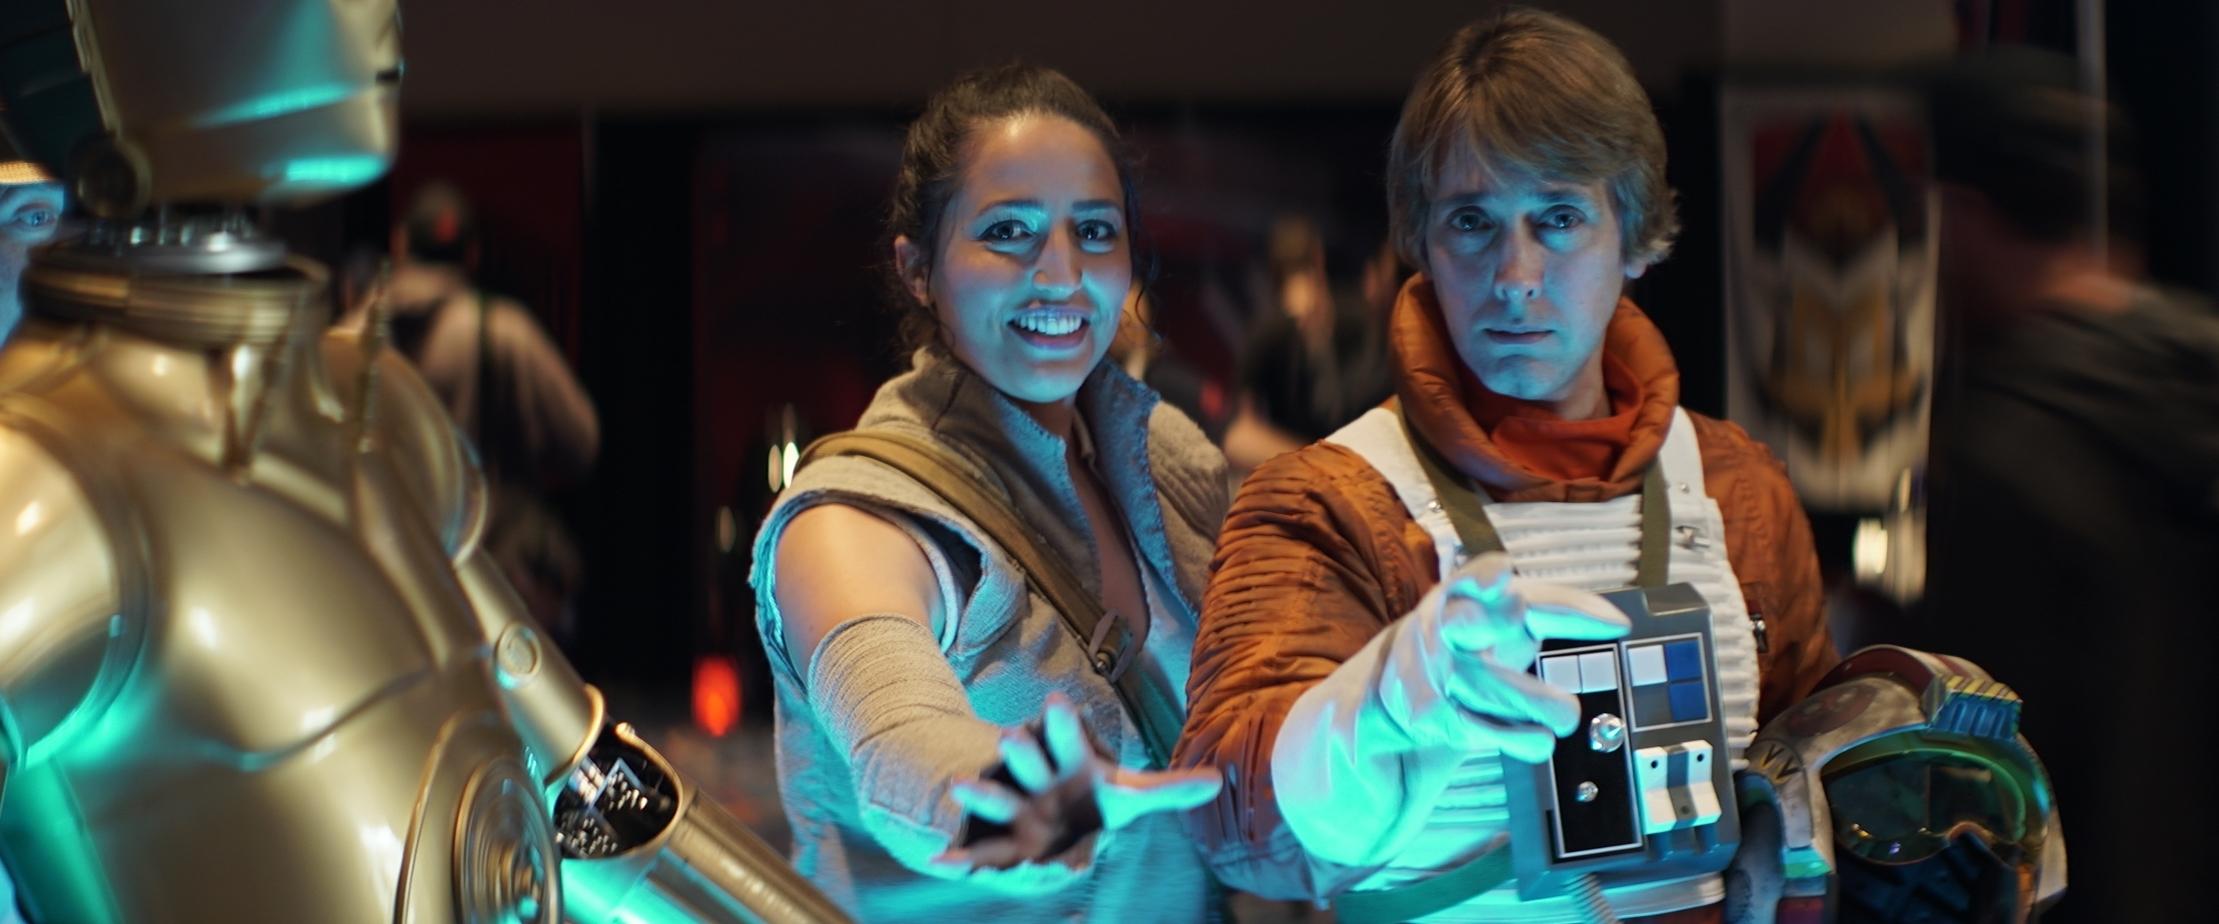 Rey & Luke Use The Force